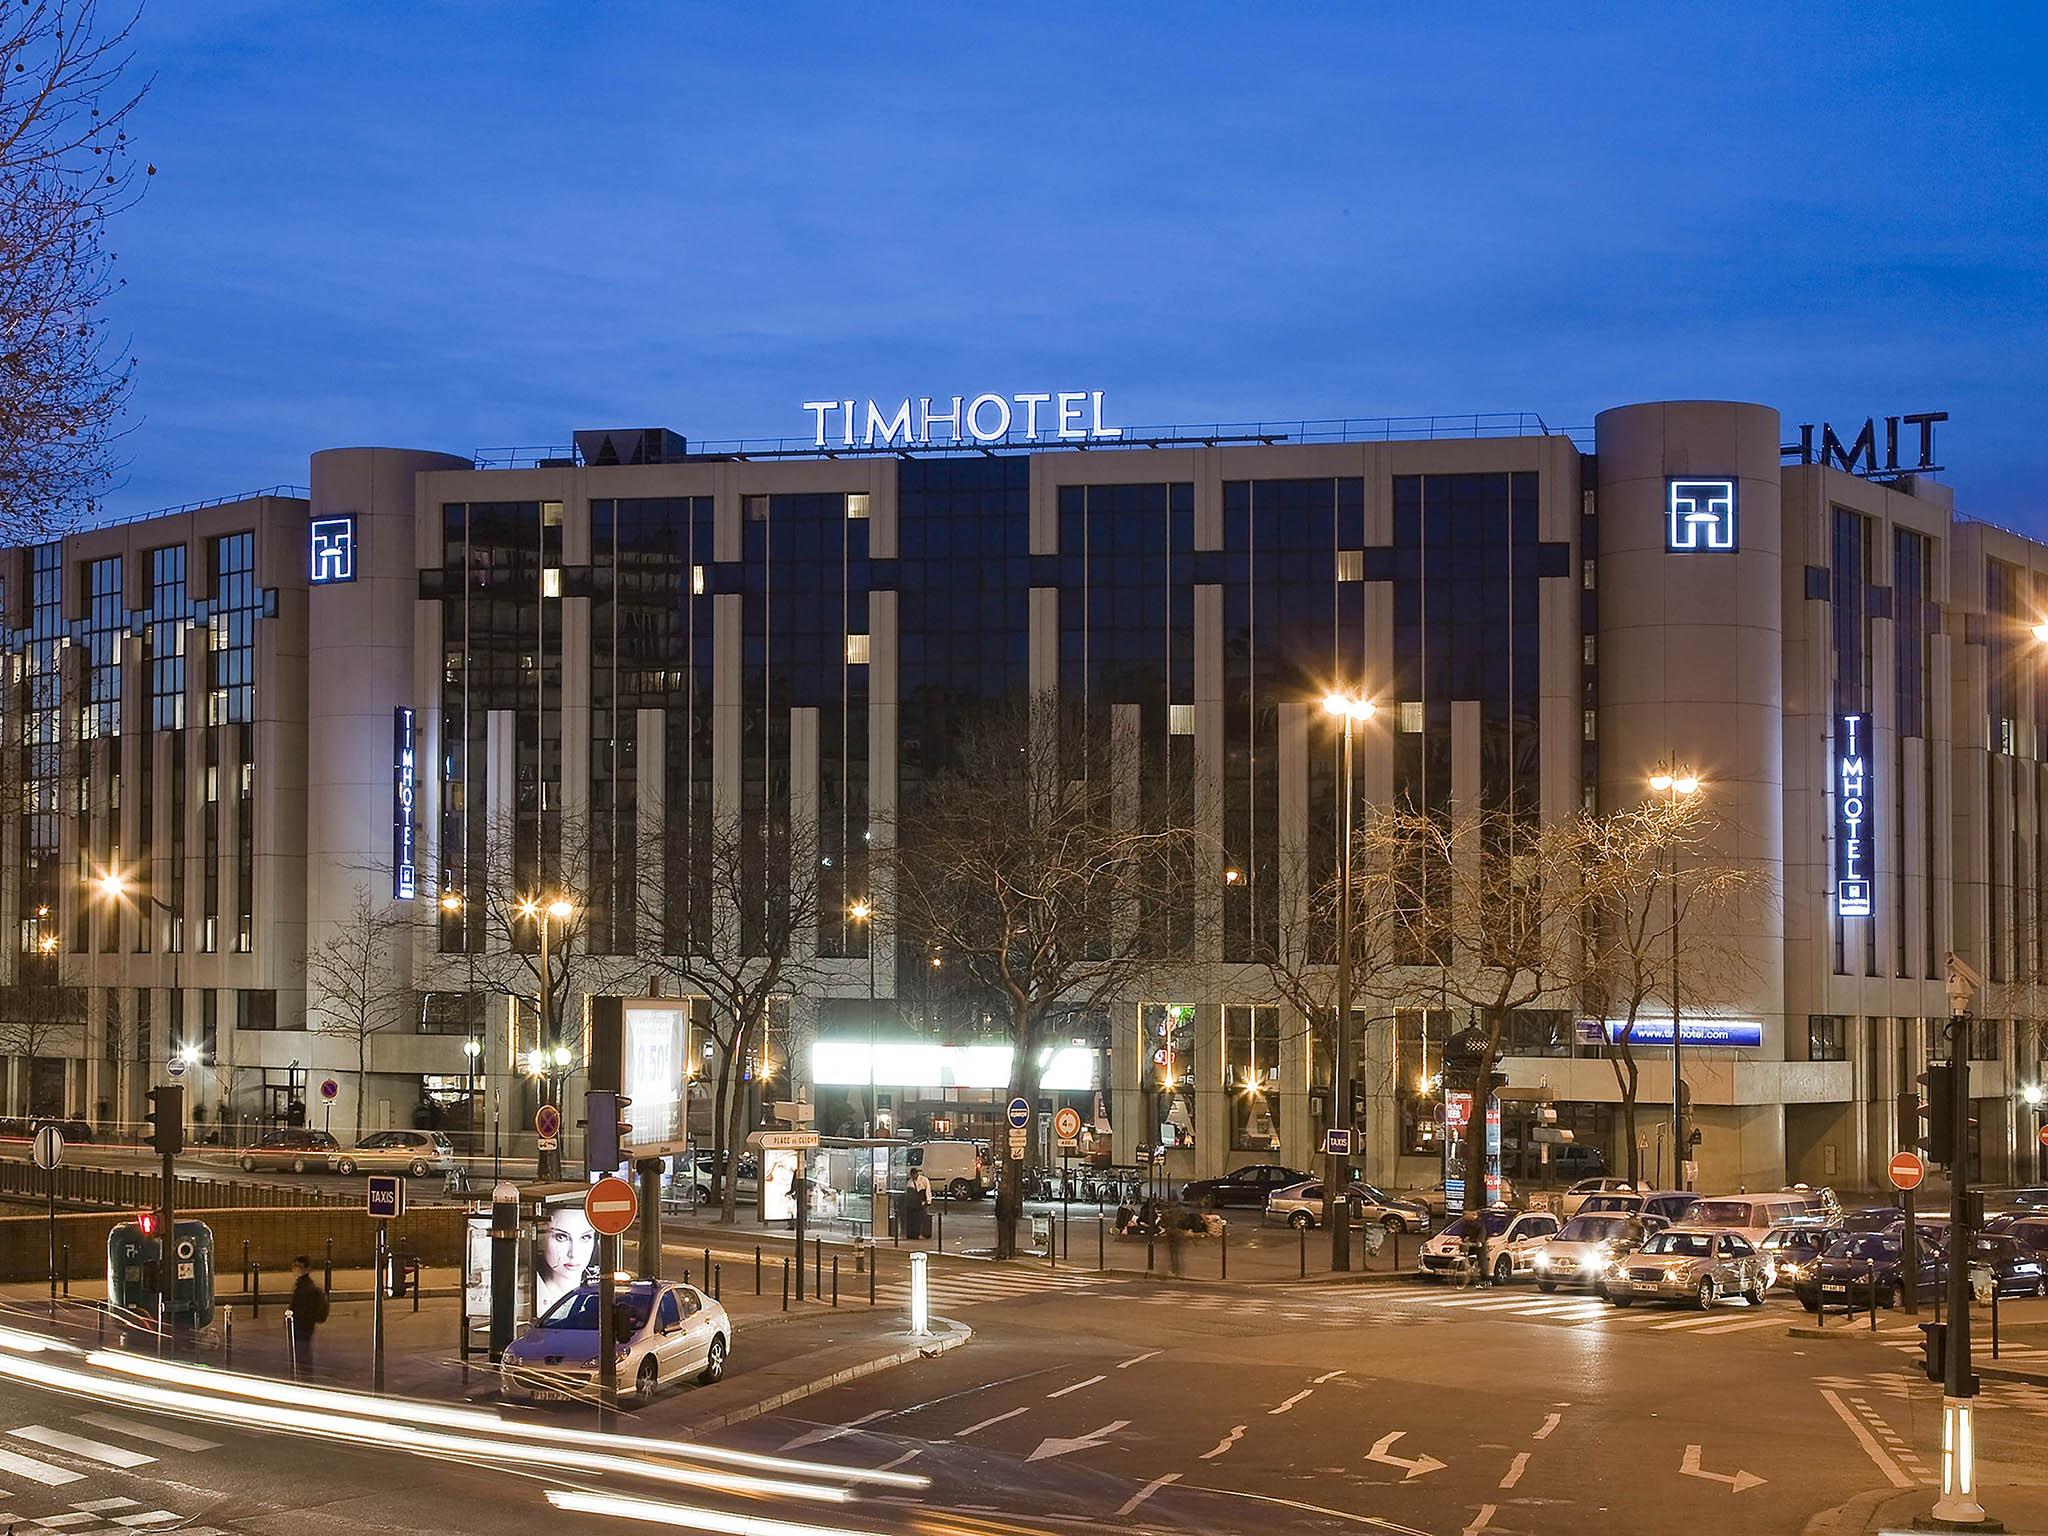 hotel in paris timhotel berthier paris 17. Black Bedroom Furniture Sets. Home Design Ideas